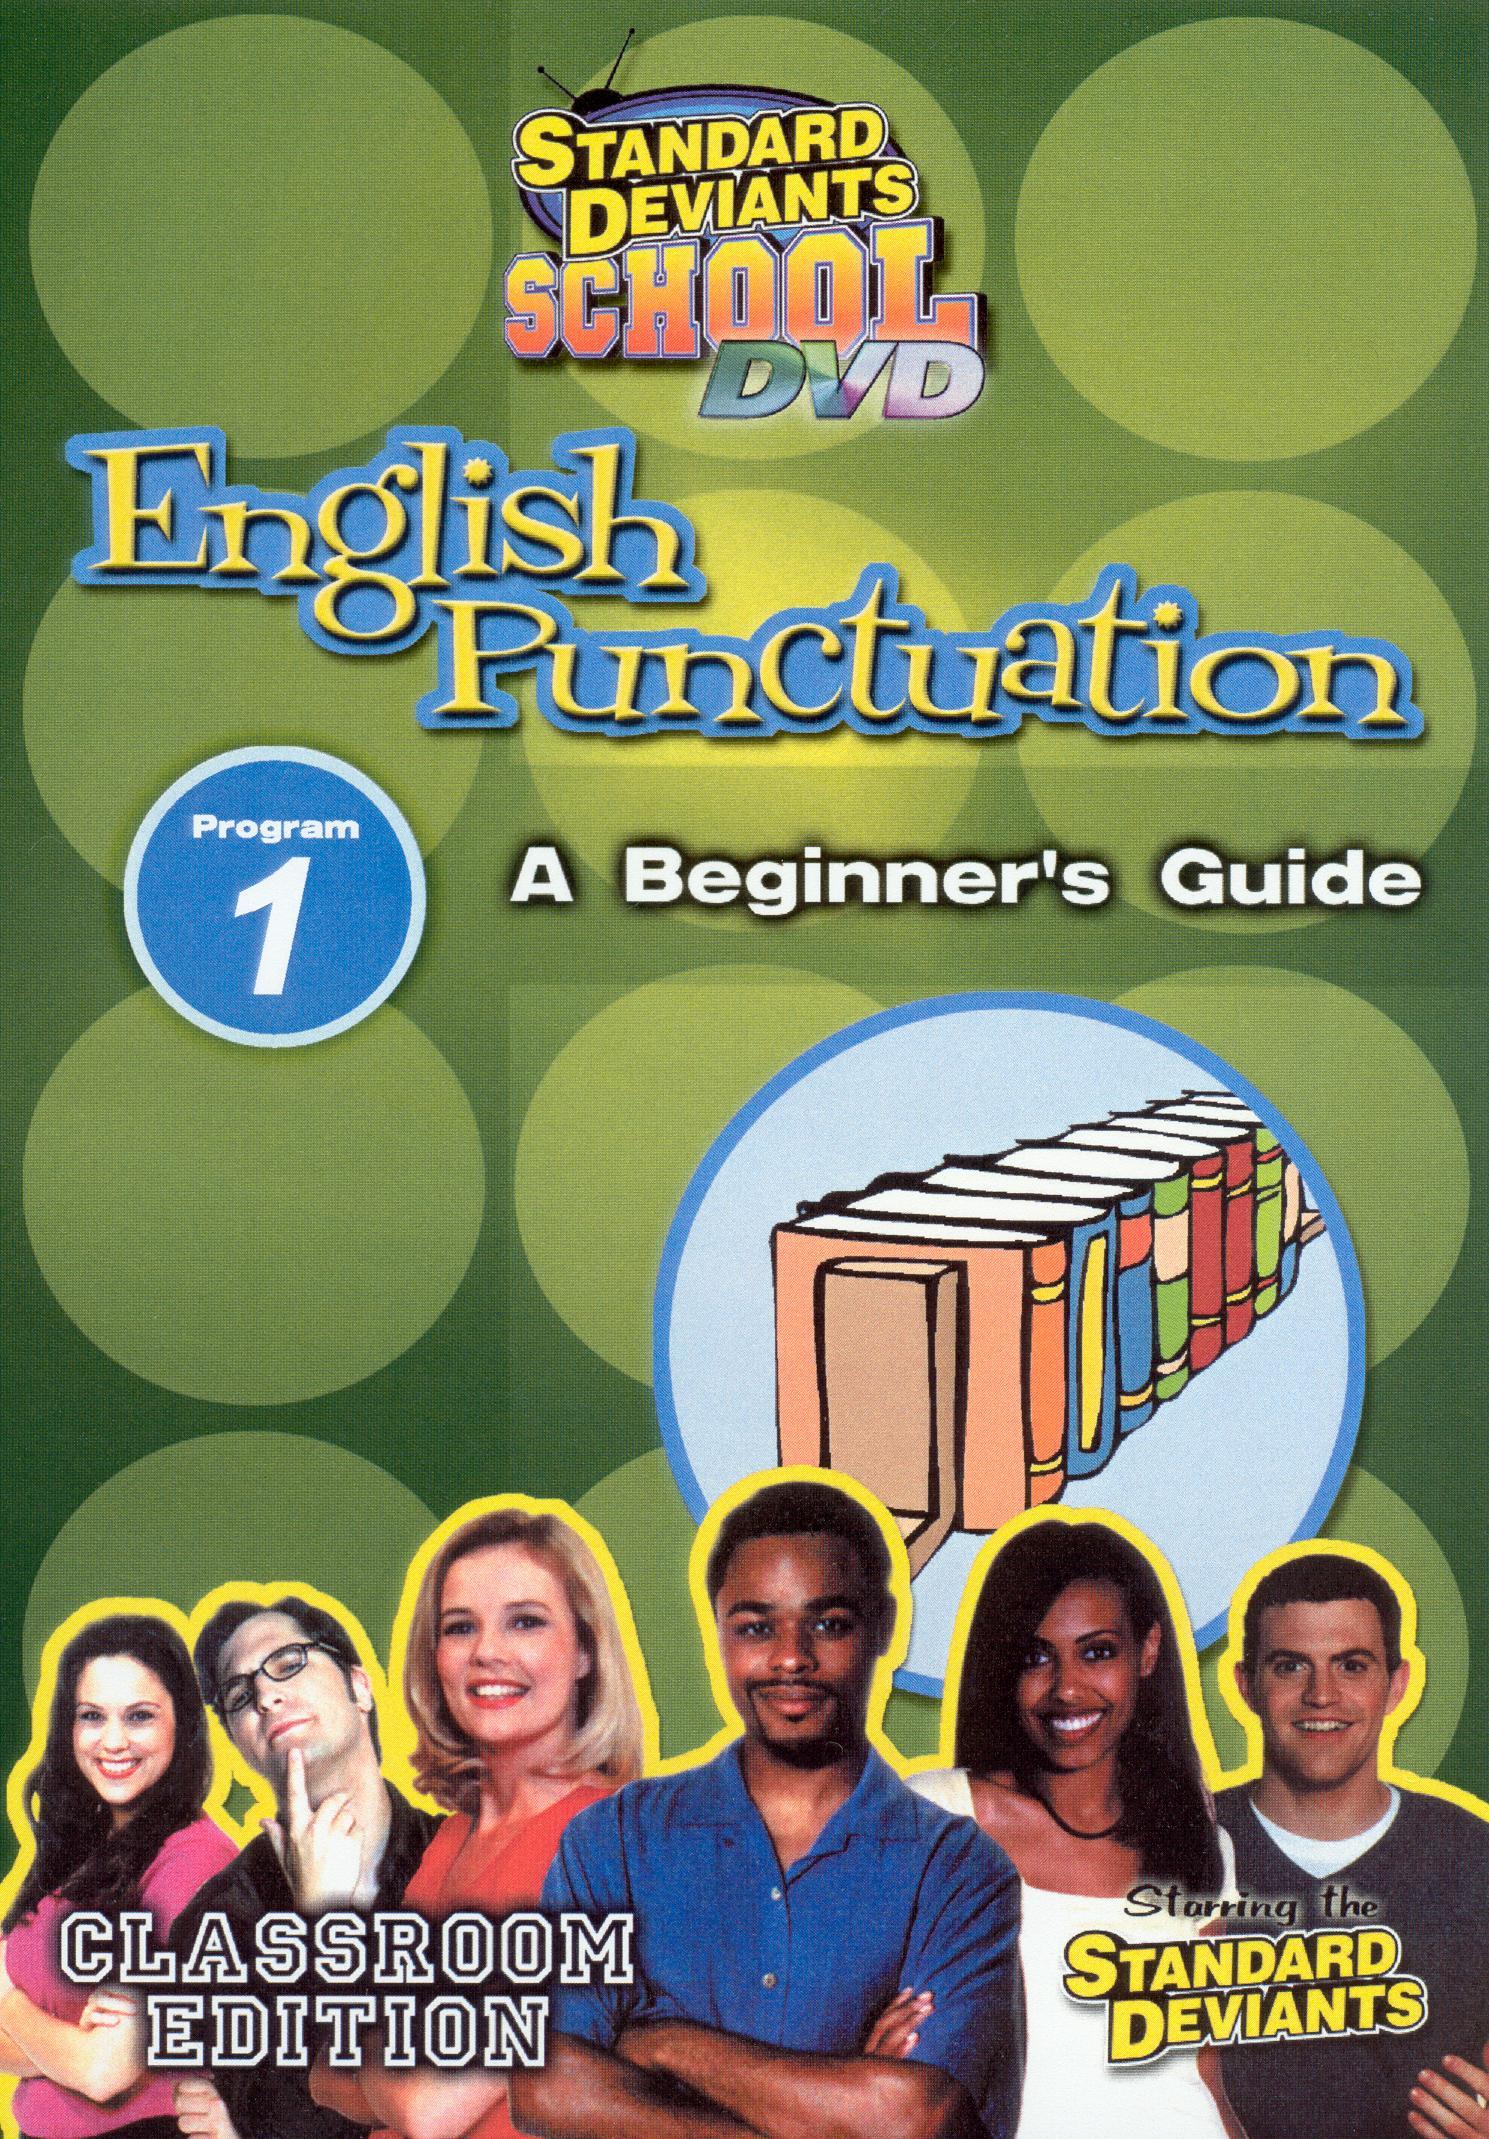 Standard Deviants School: English Puncuation, Program 1